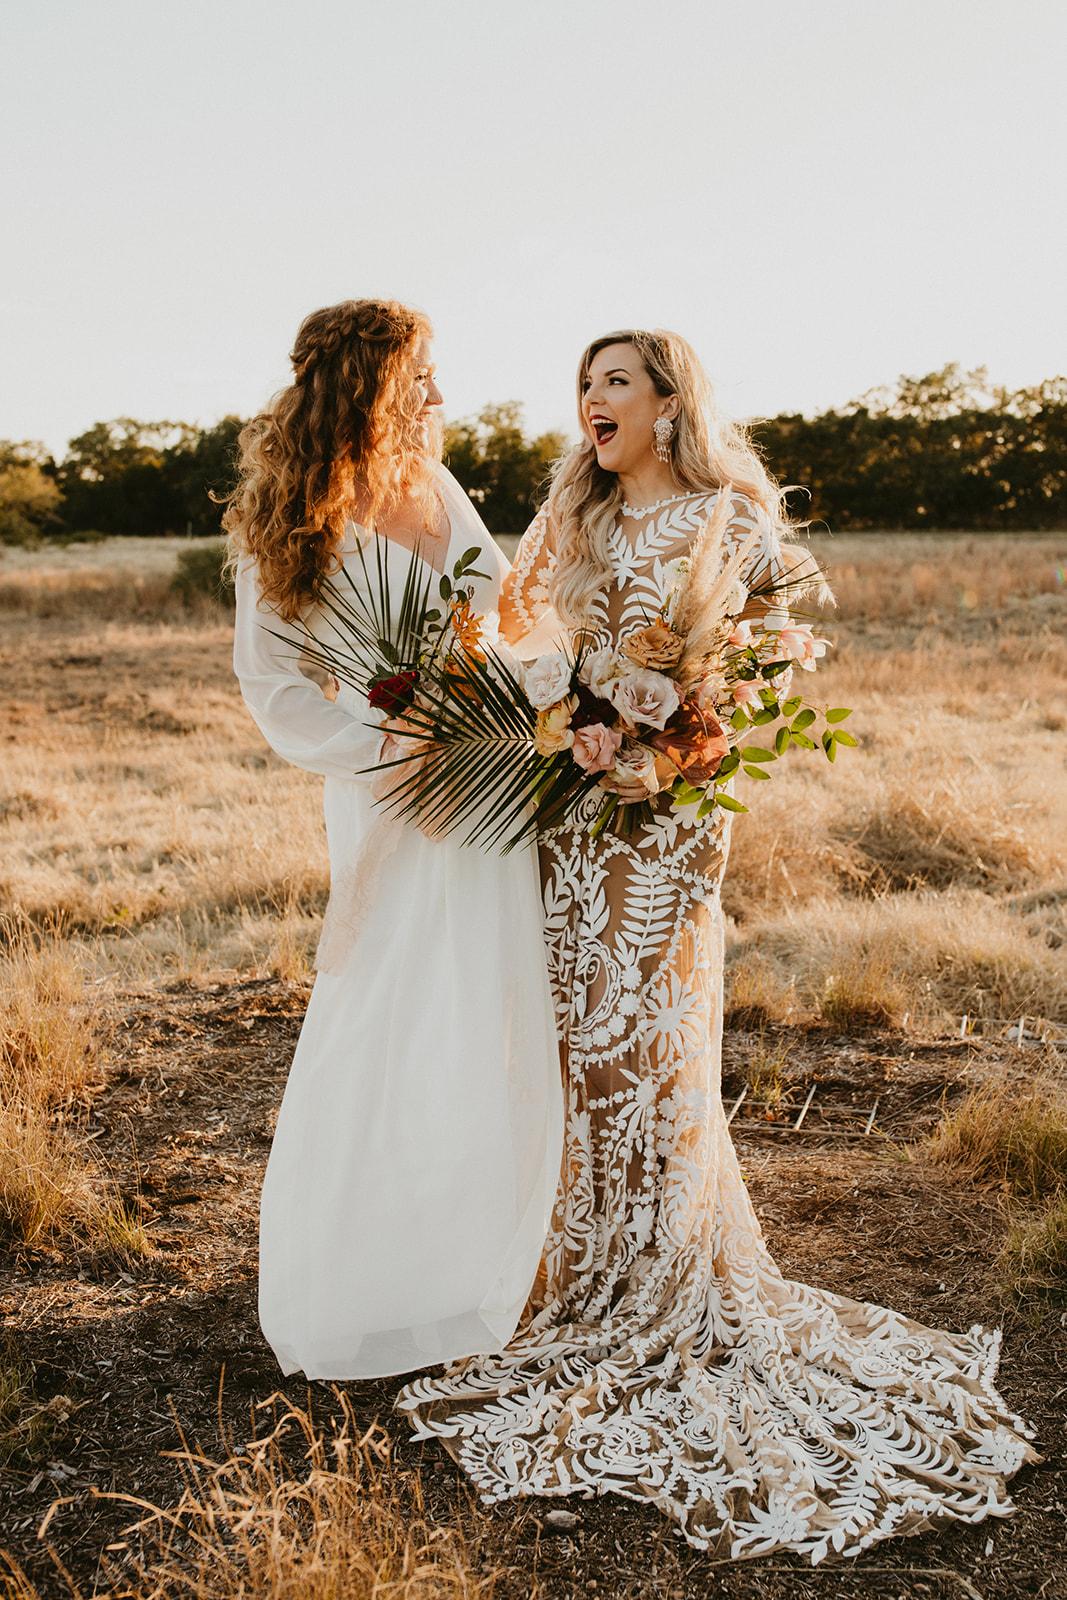 Tropical Colorful Frond Bridesmaid + Bride Bouquets + White Creamy Bridesmaid Dresses + Rue De Seine Wedding Dress + Boho Wedding + Dallas Wedding Florist Tersilla